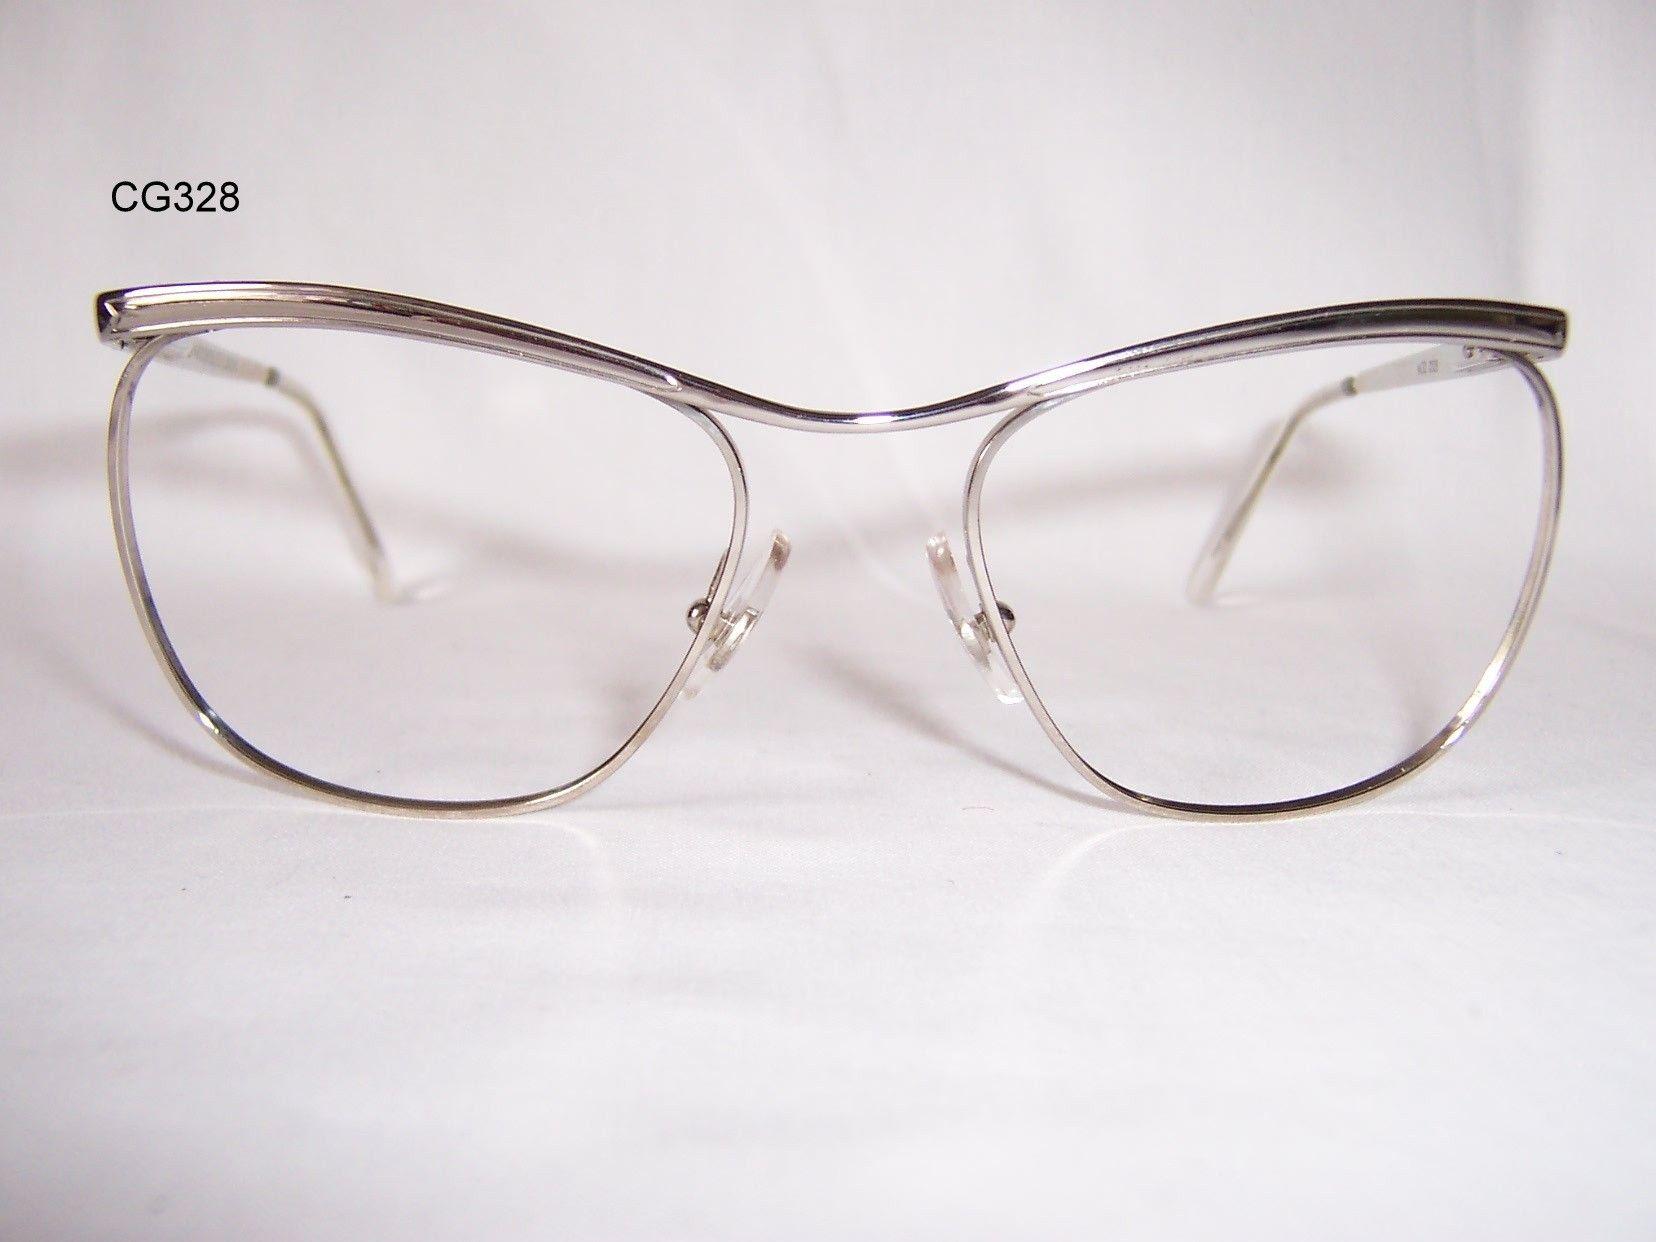 1c2f46aa036 Cutler and Gross Mod 0328 - Vintage Glasses - Dead Men s Spex ...